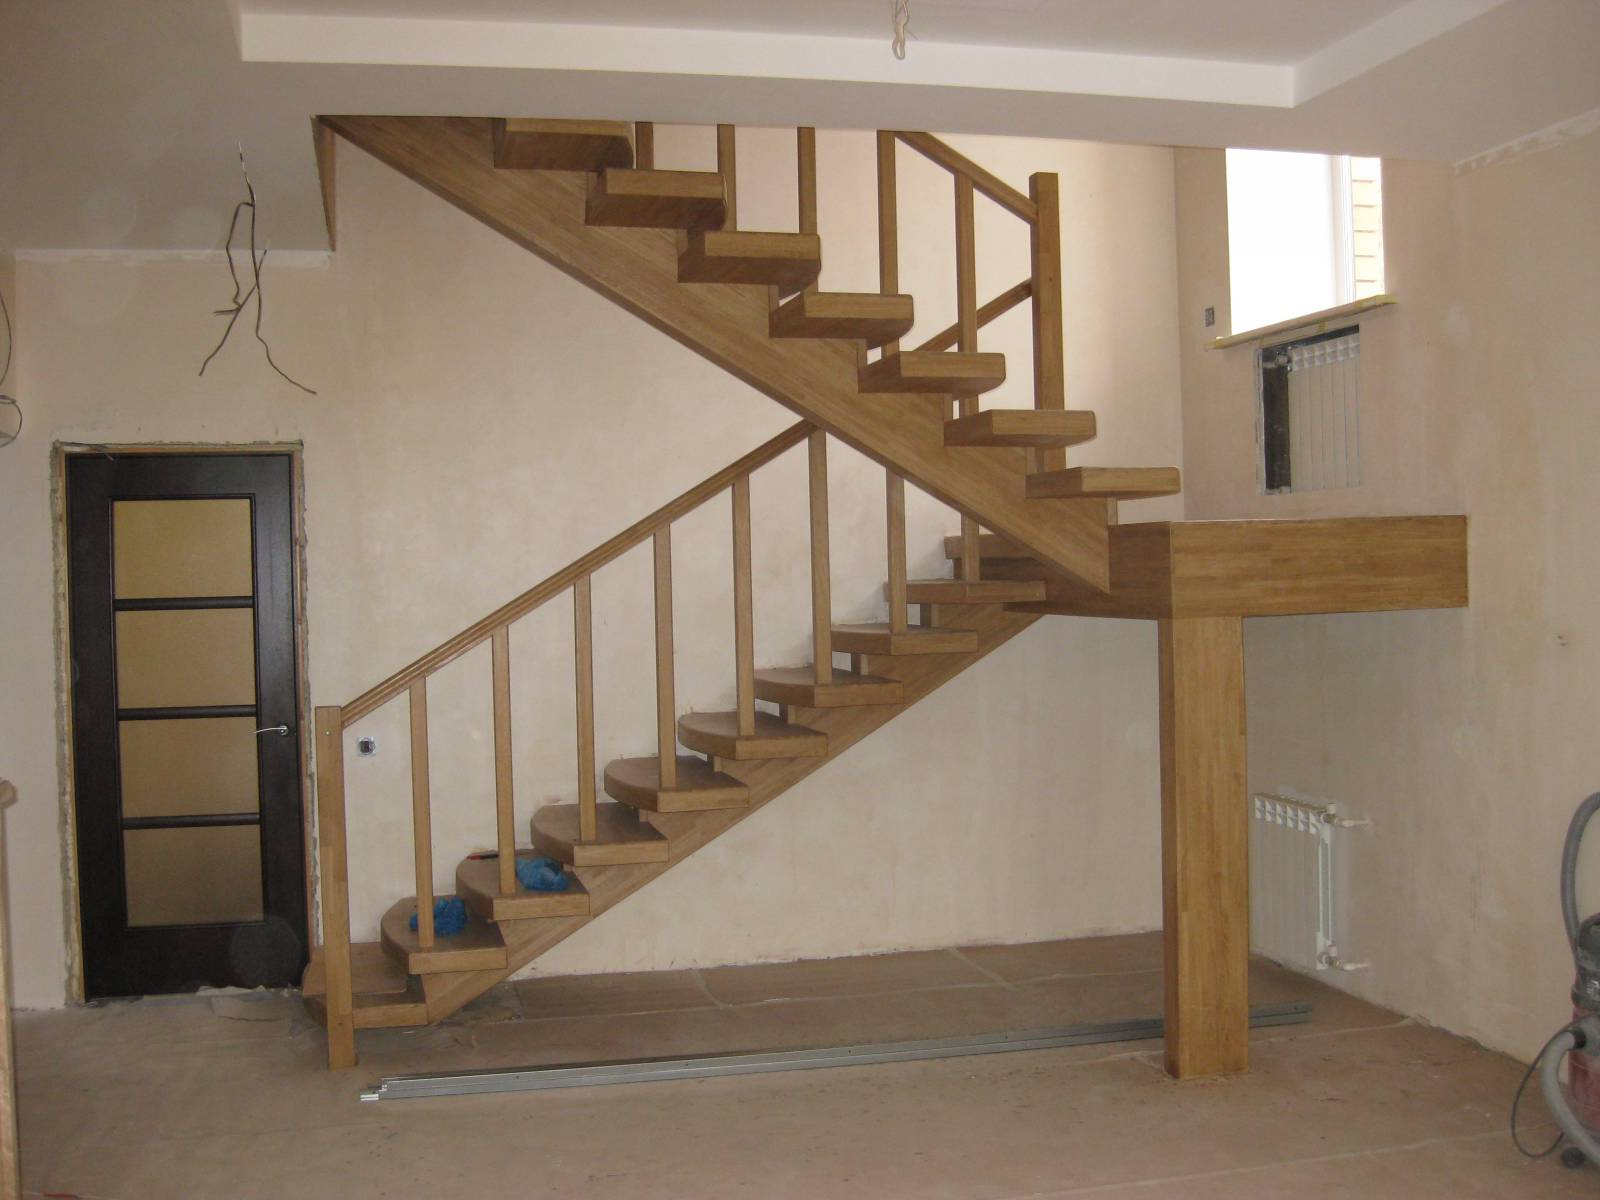 Забежная лестница 180 градусов своими руками фото 623